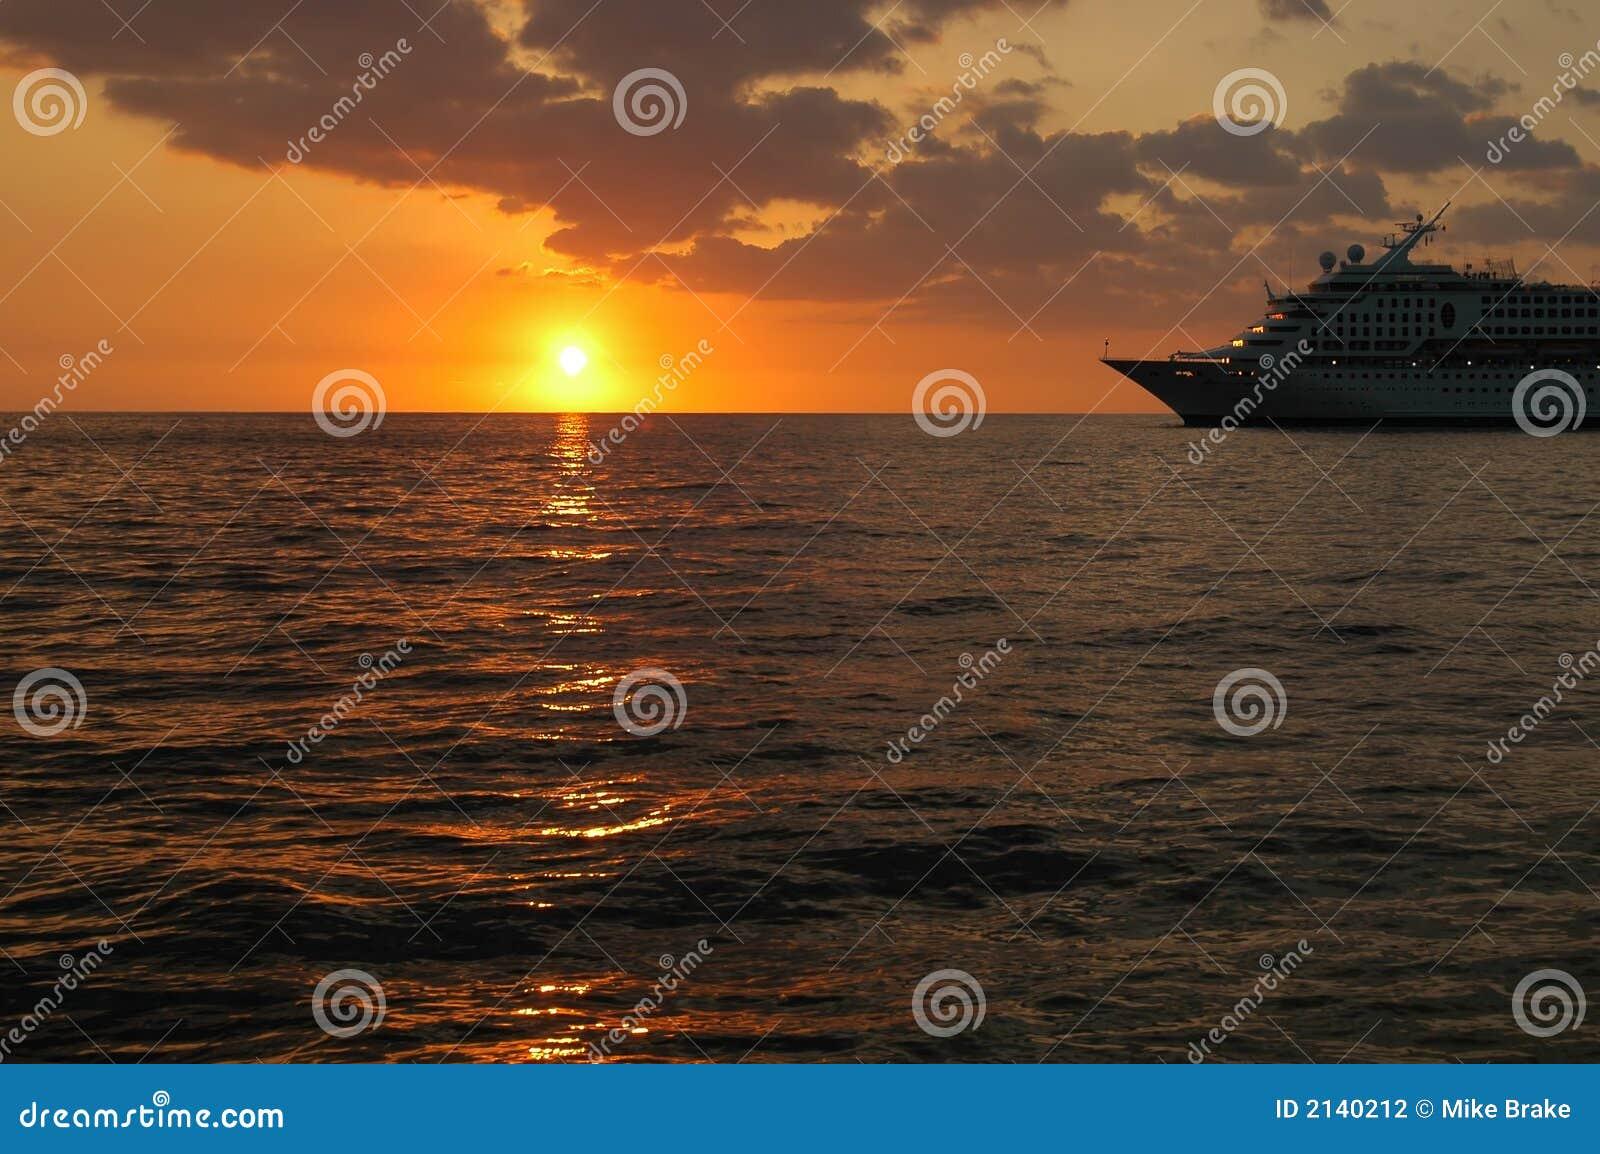 Cruise Ship Into Sunset